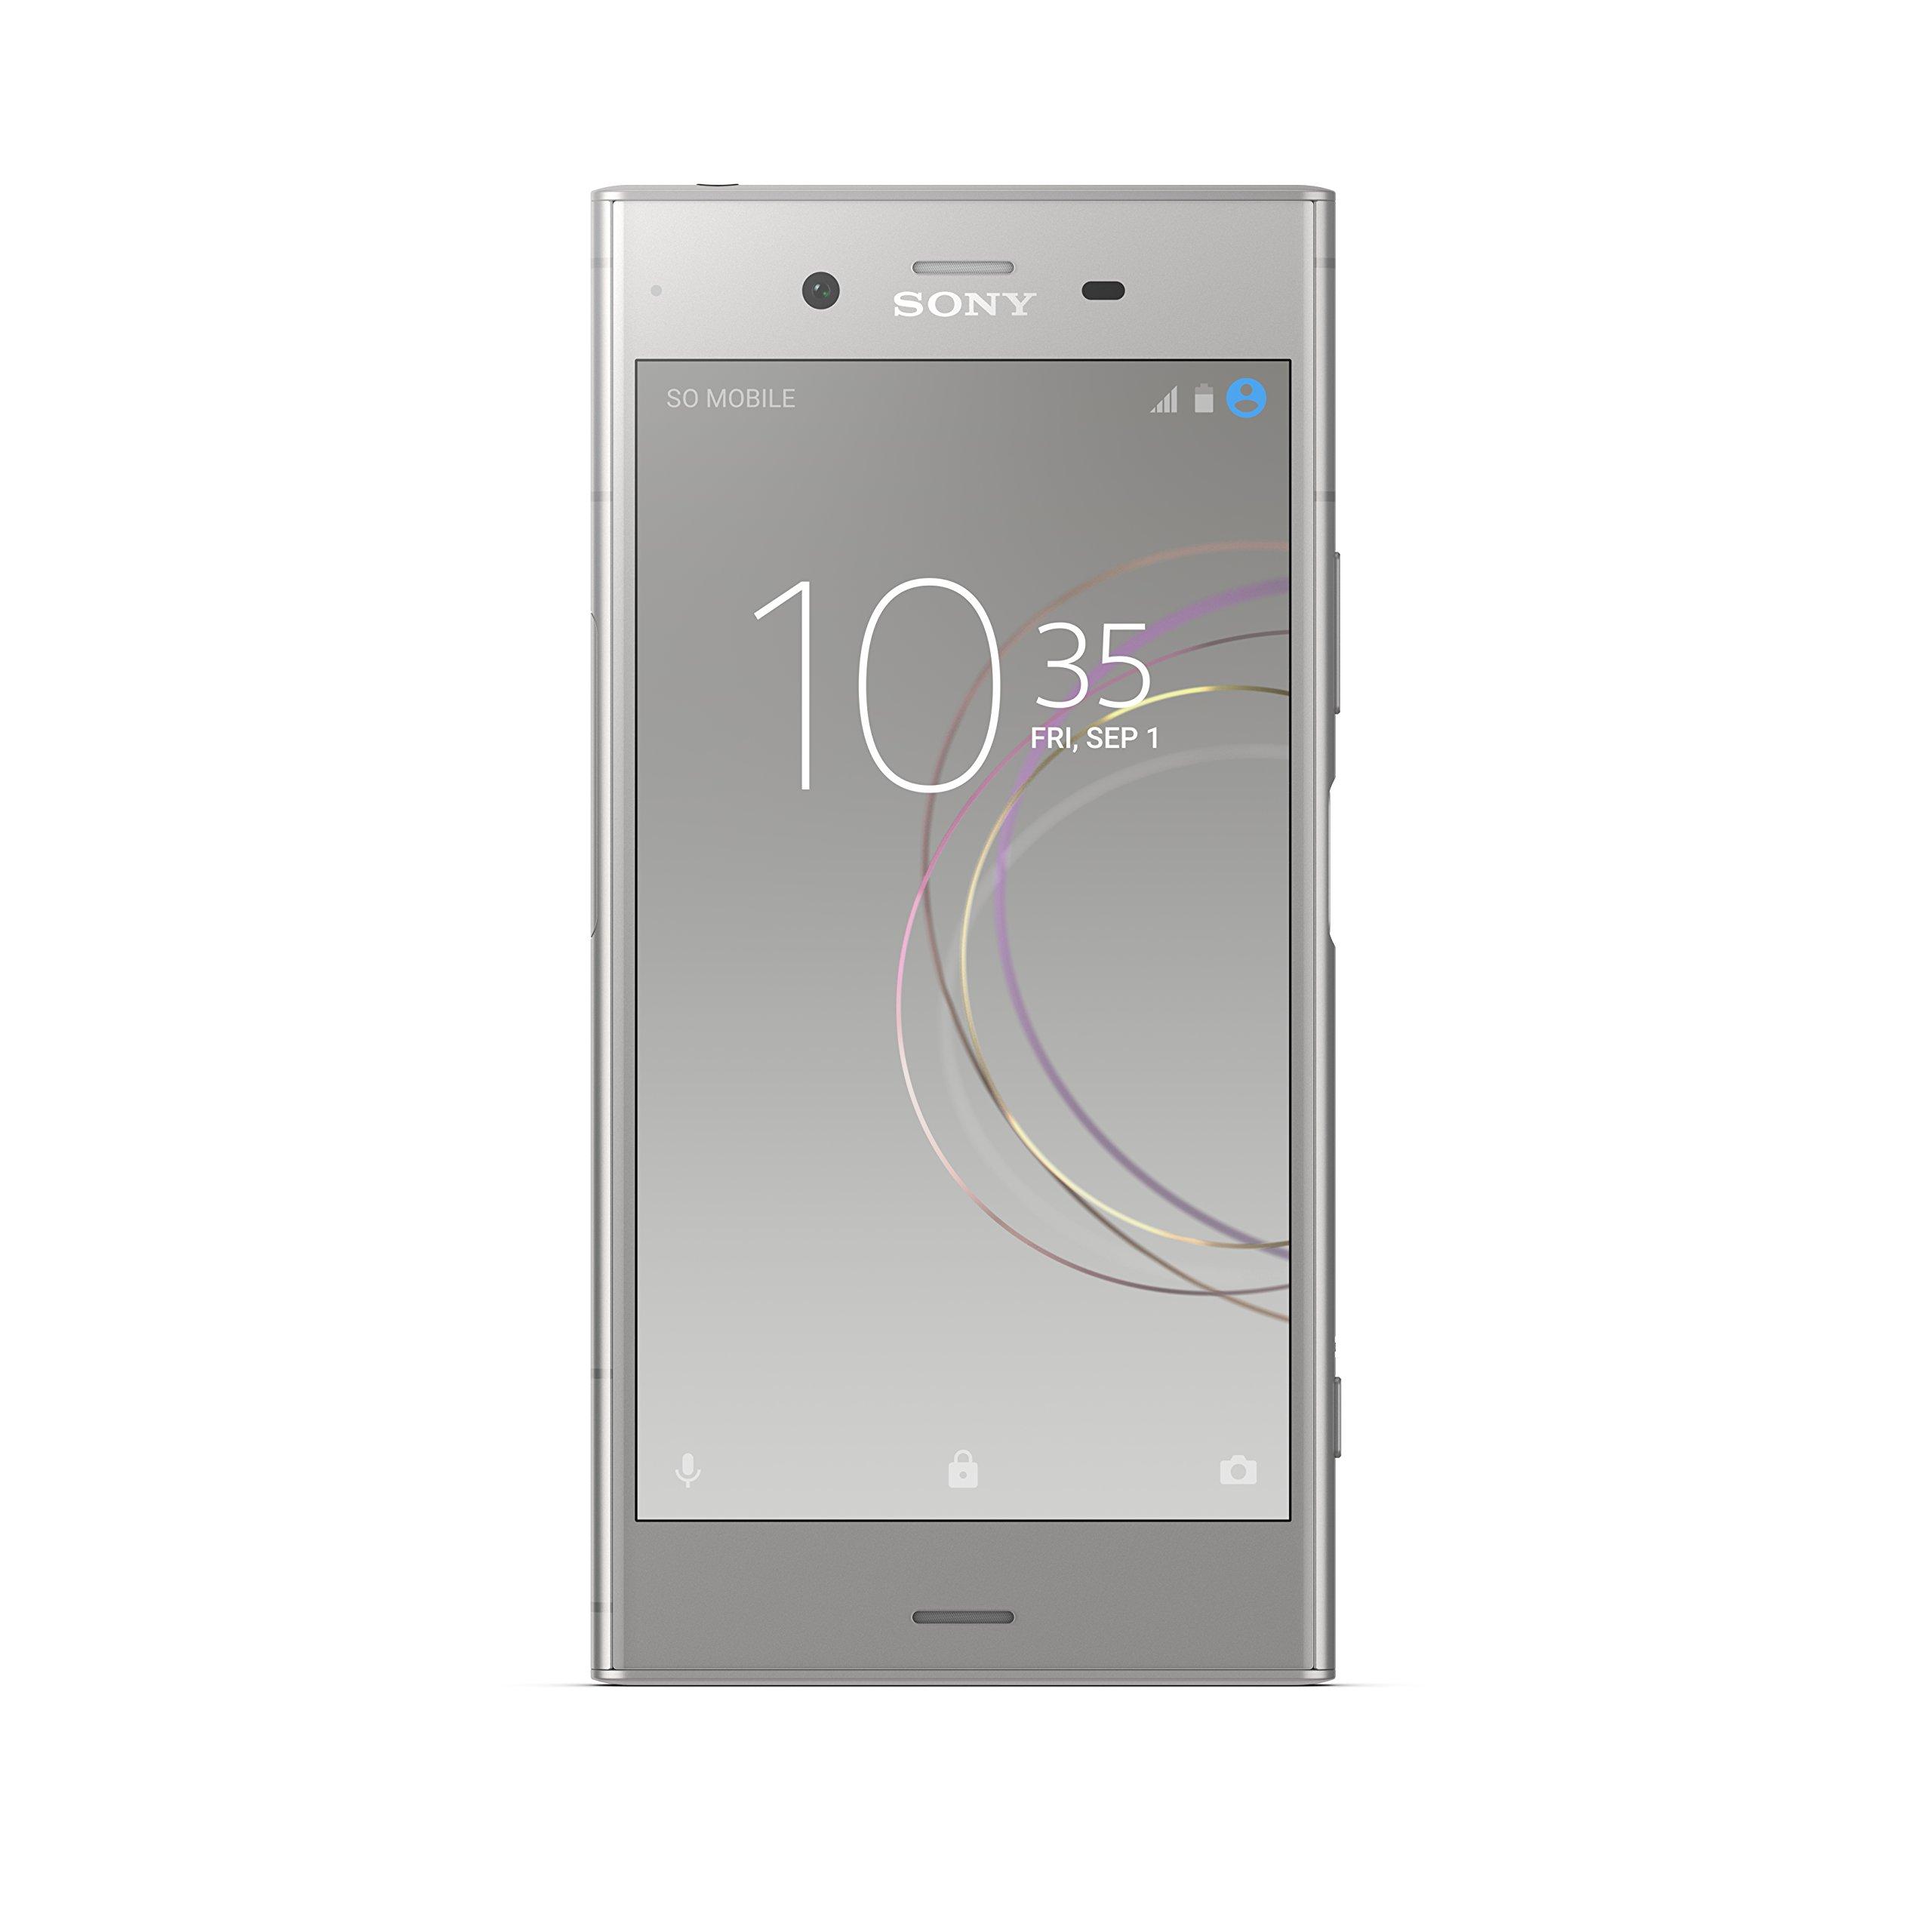 "Sony Xperia XZ1 Factory Unlocked Phone - 5.2"" Full HD HDR Display - 64GB - Warm Silver (U.S. Warranty)"